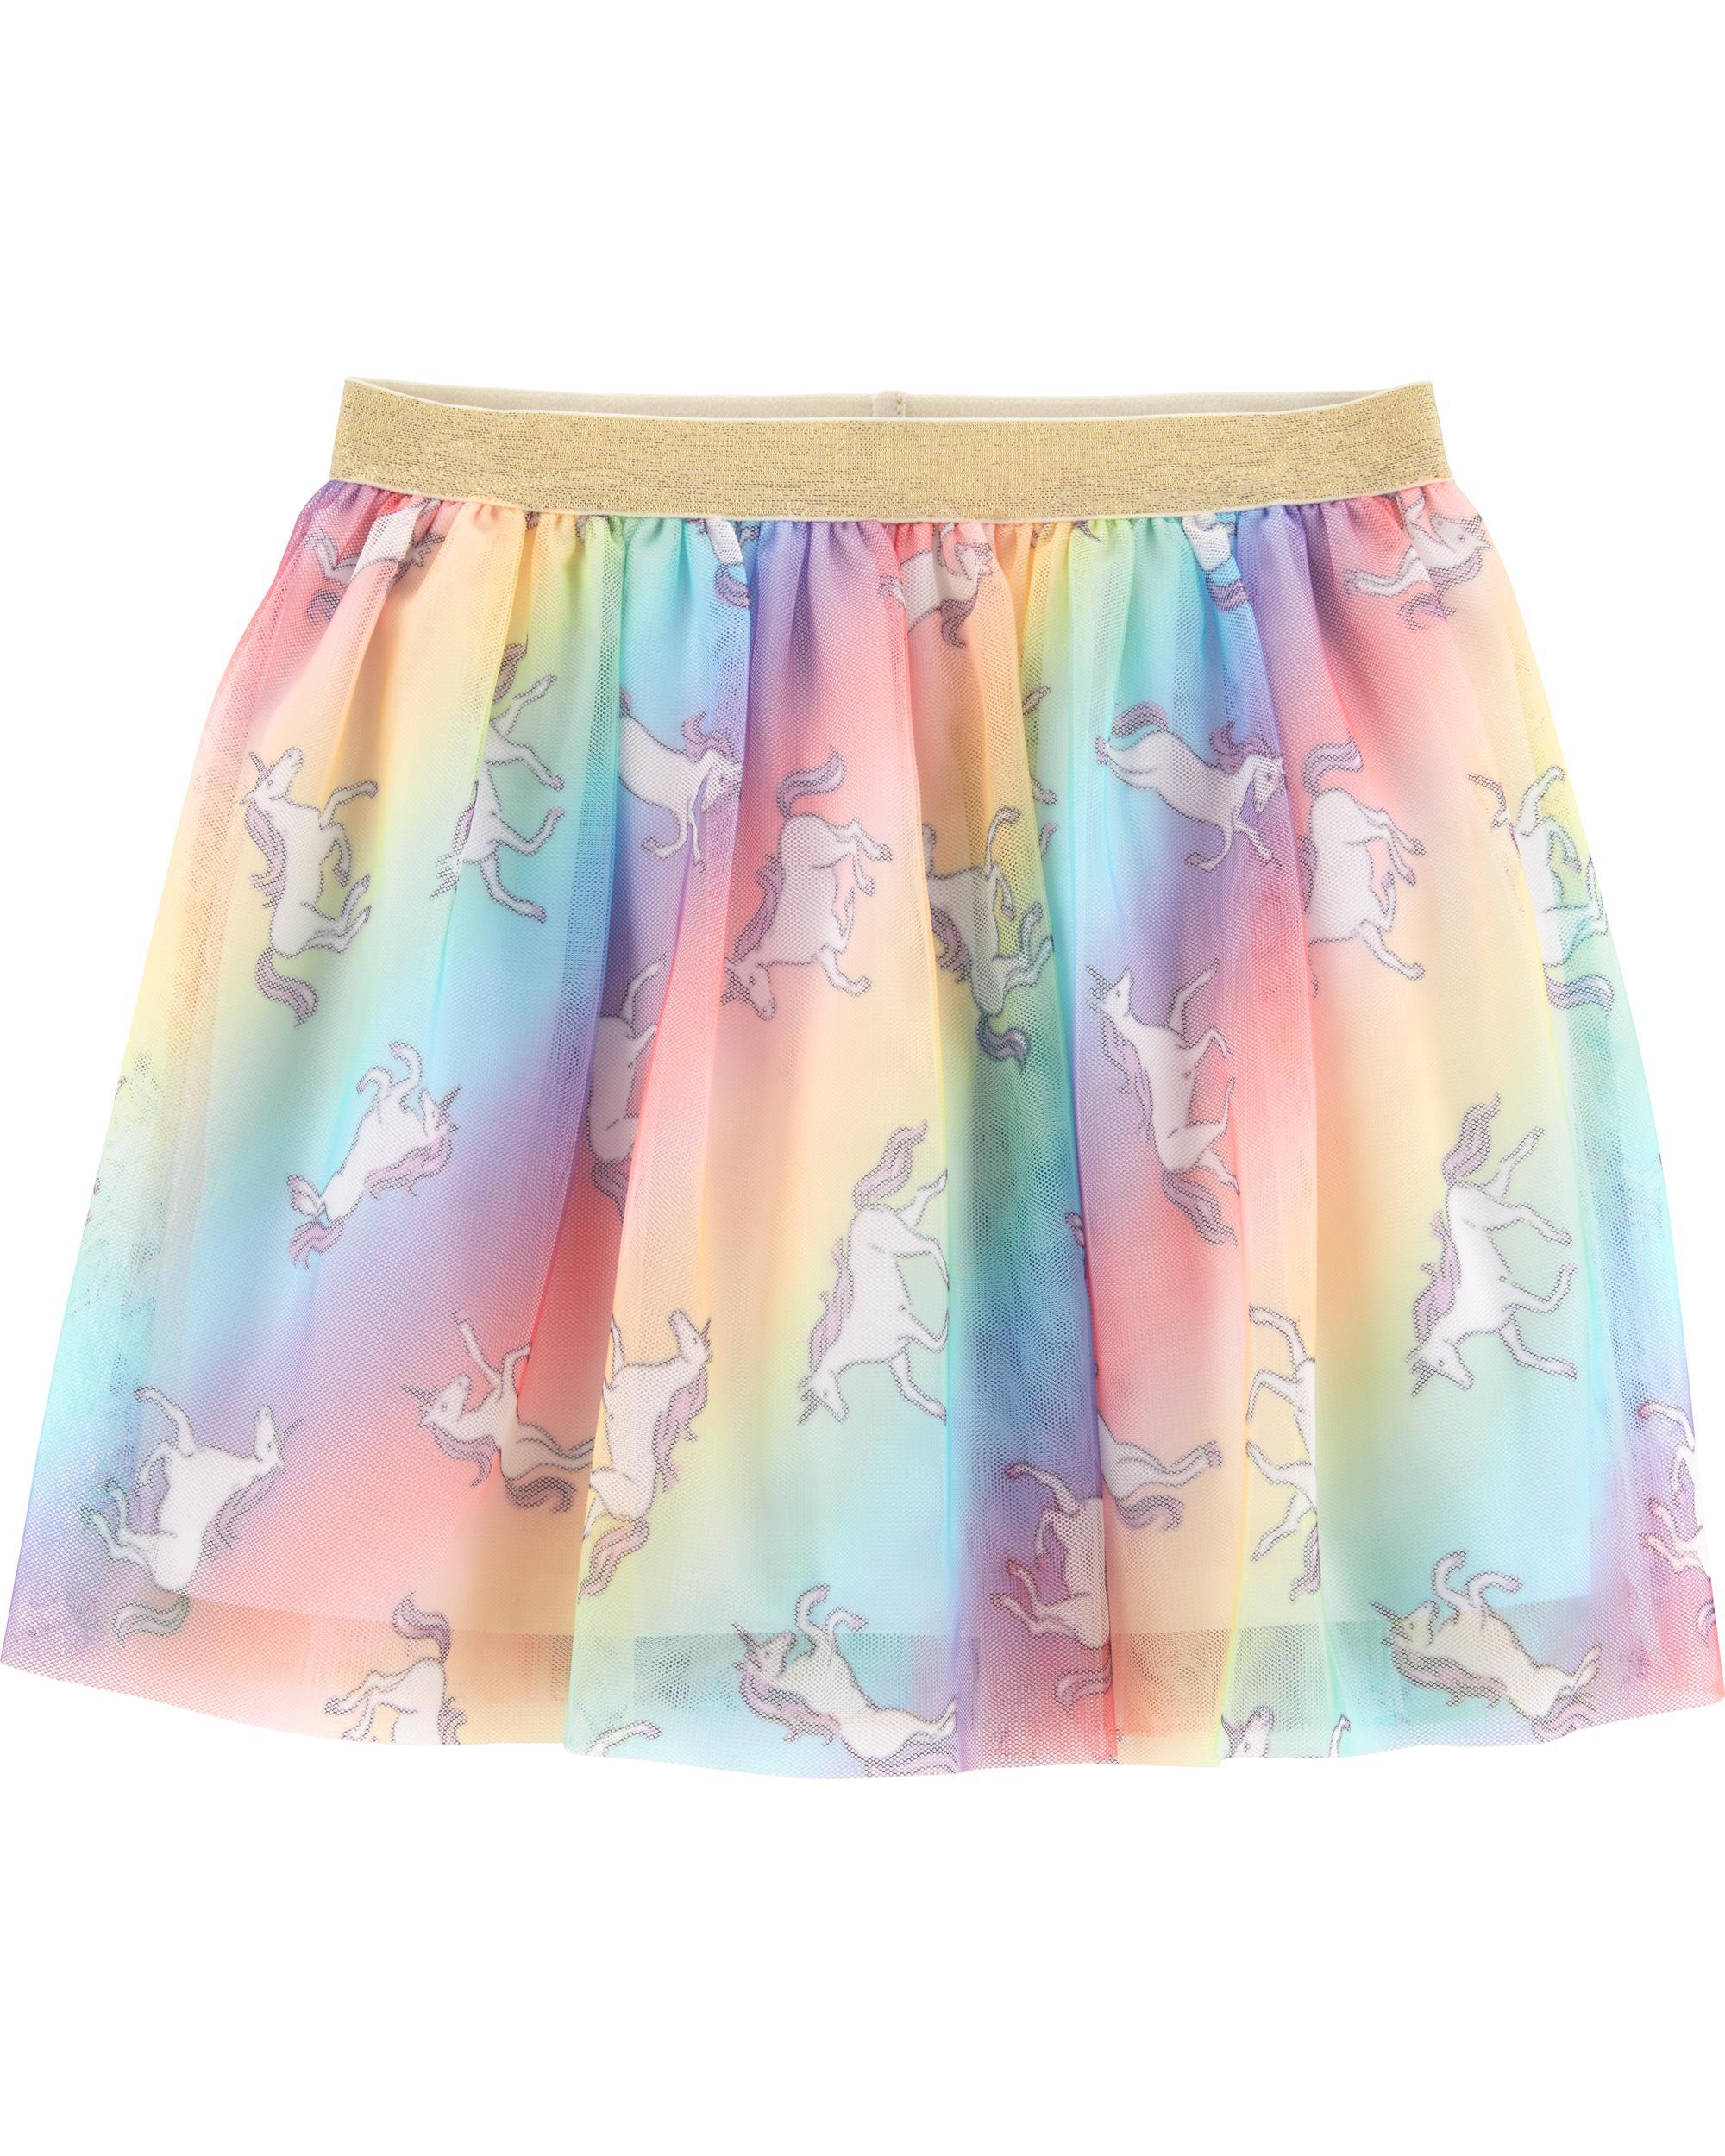 7a9b495d43f1c Unicorn Tulle Skirt | carters.com